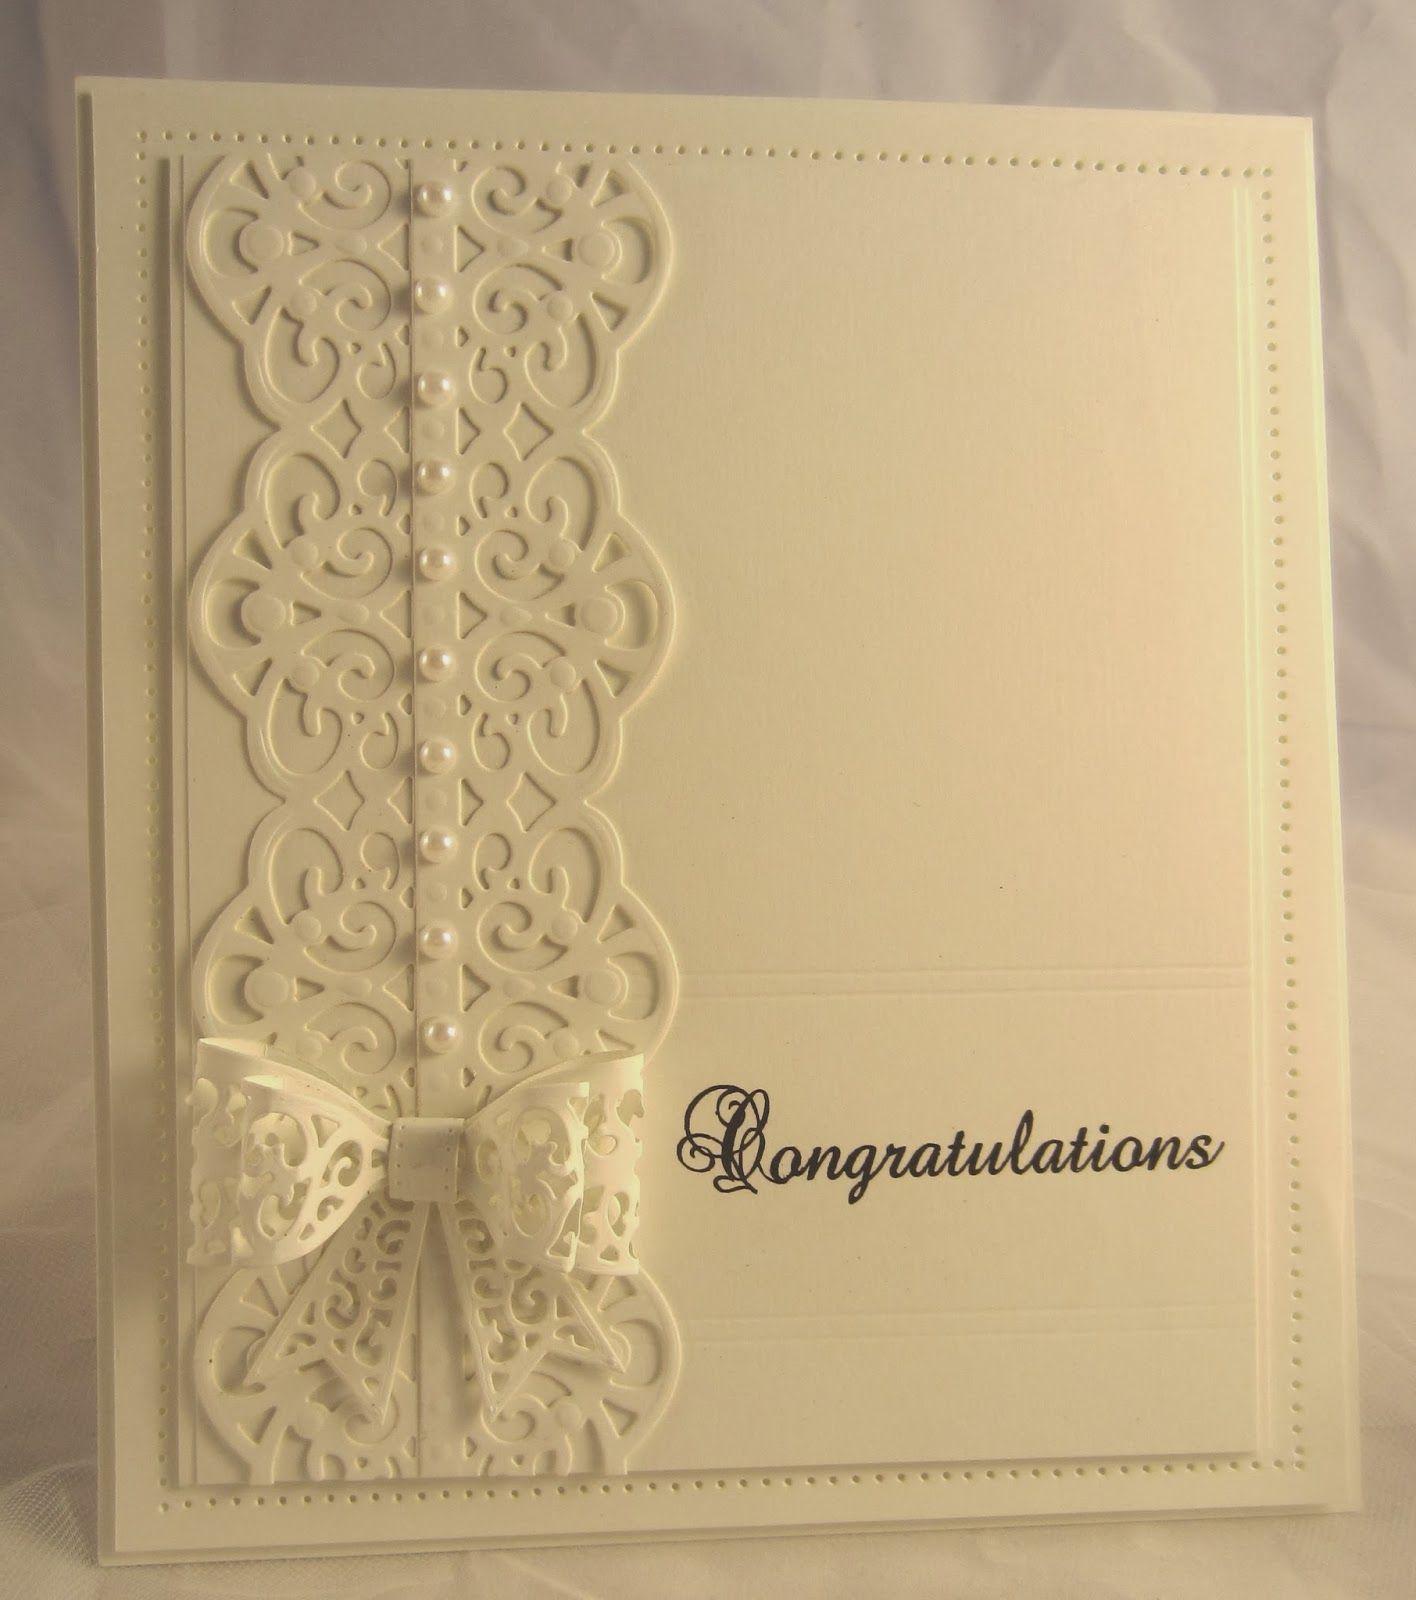 How to scrapbook wedding cards - News